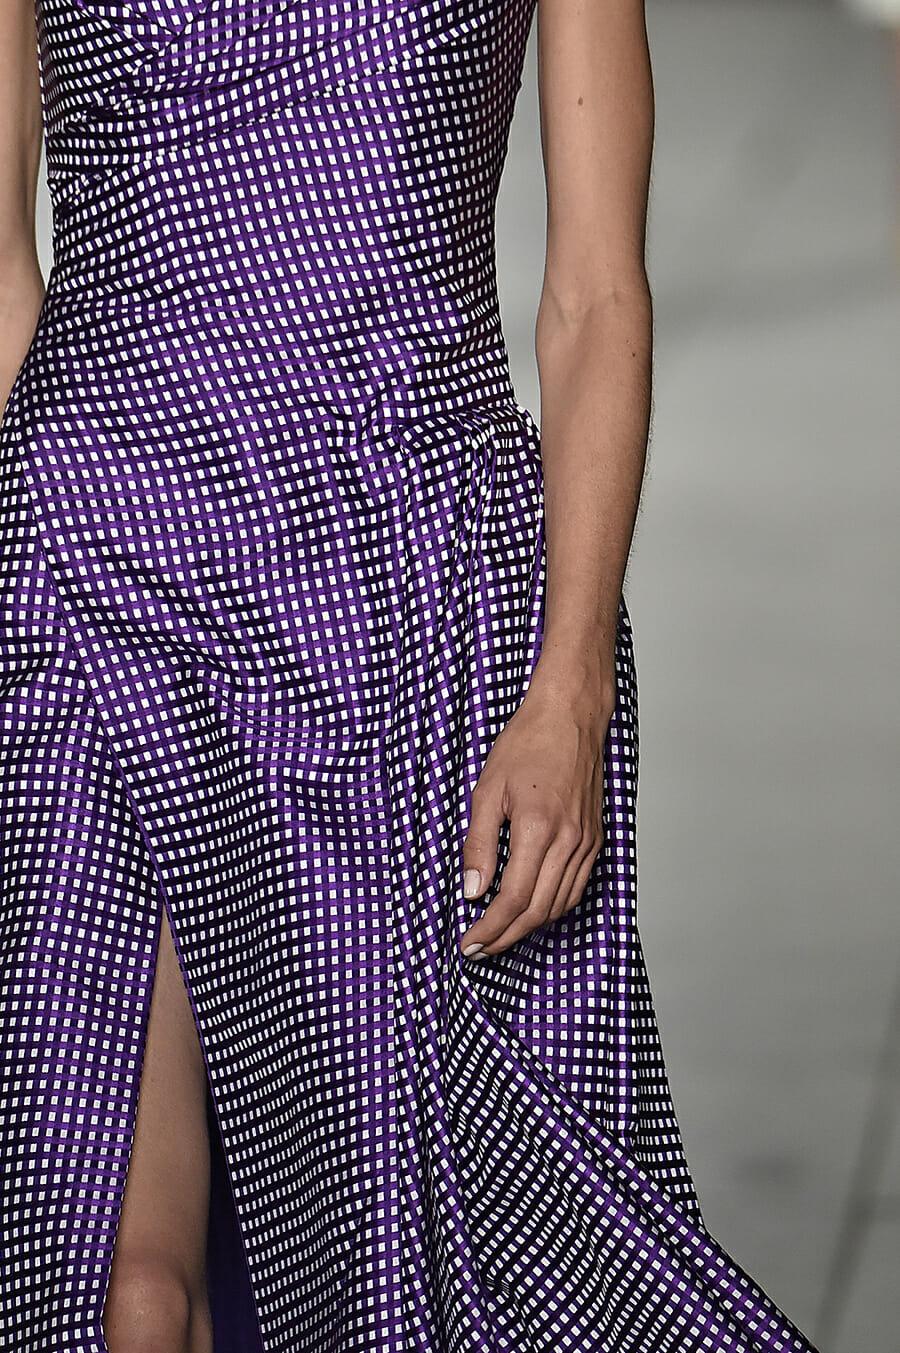 Carolina-Herrera-New-York-Fashion-Week-Spring-Summer-2018-NY-September-2017-look1-detail2